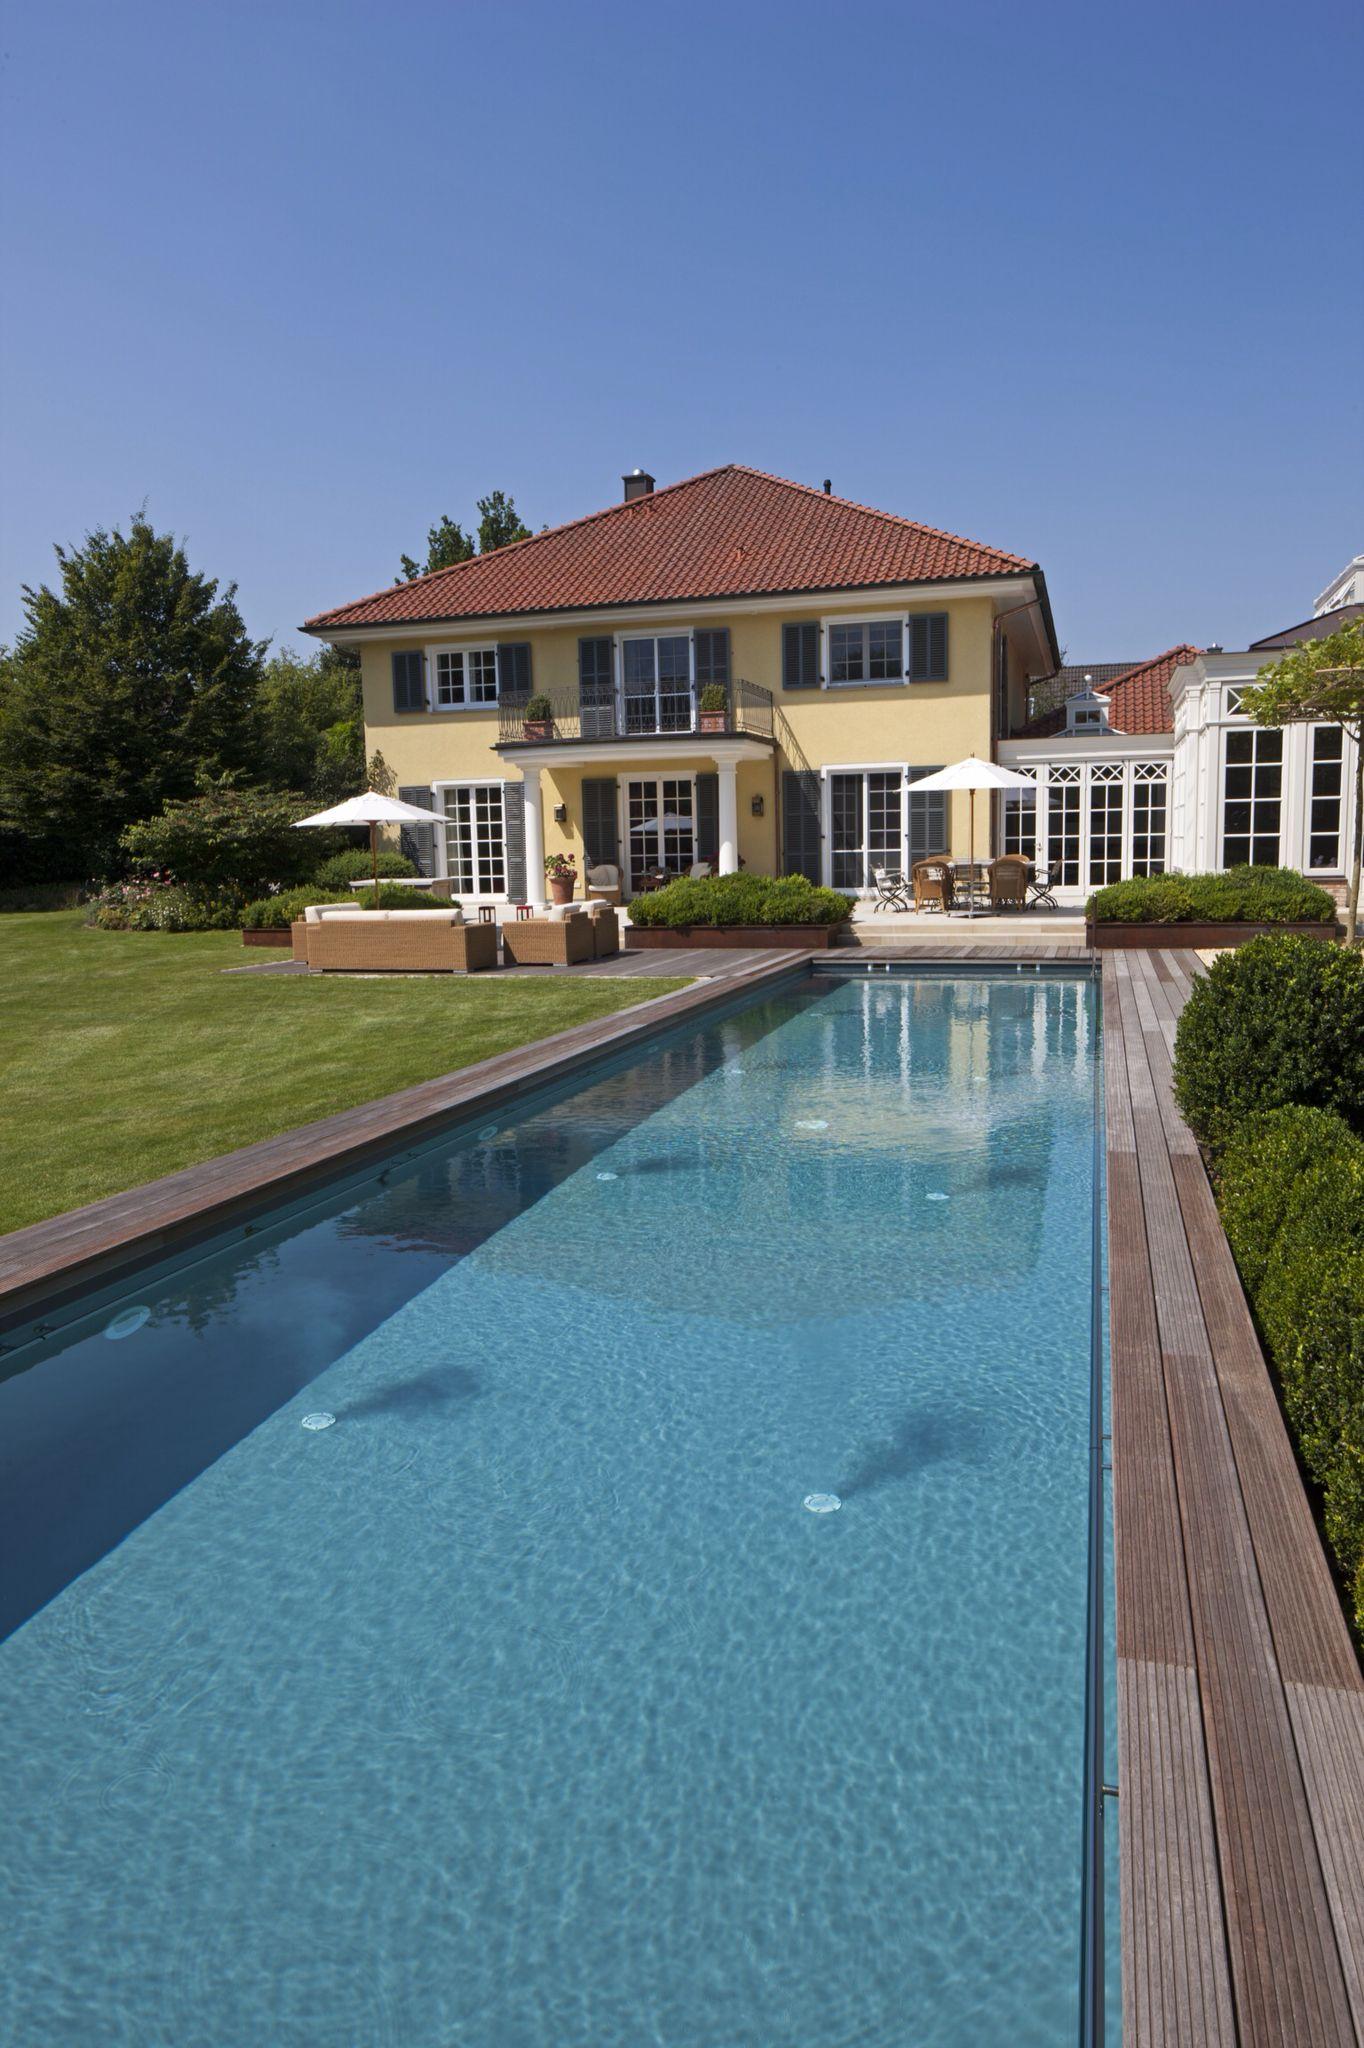 pool mit salzelektrolyse salzwasser pool im garten harms. Black Bedroom Furniture Sets. Home Design Ideas